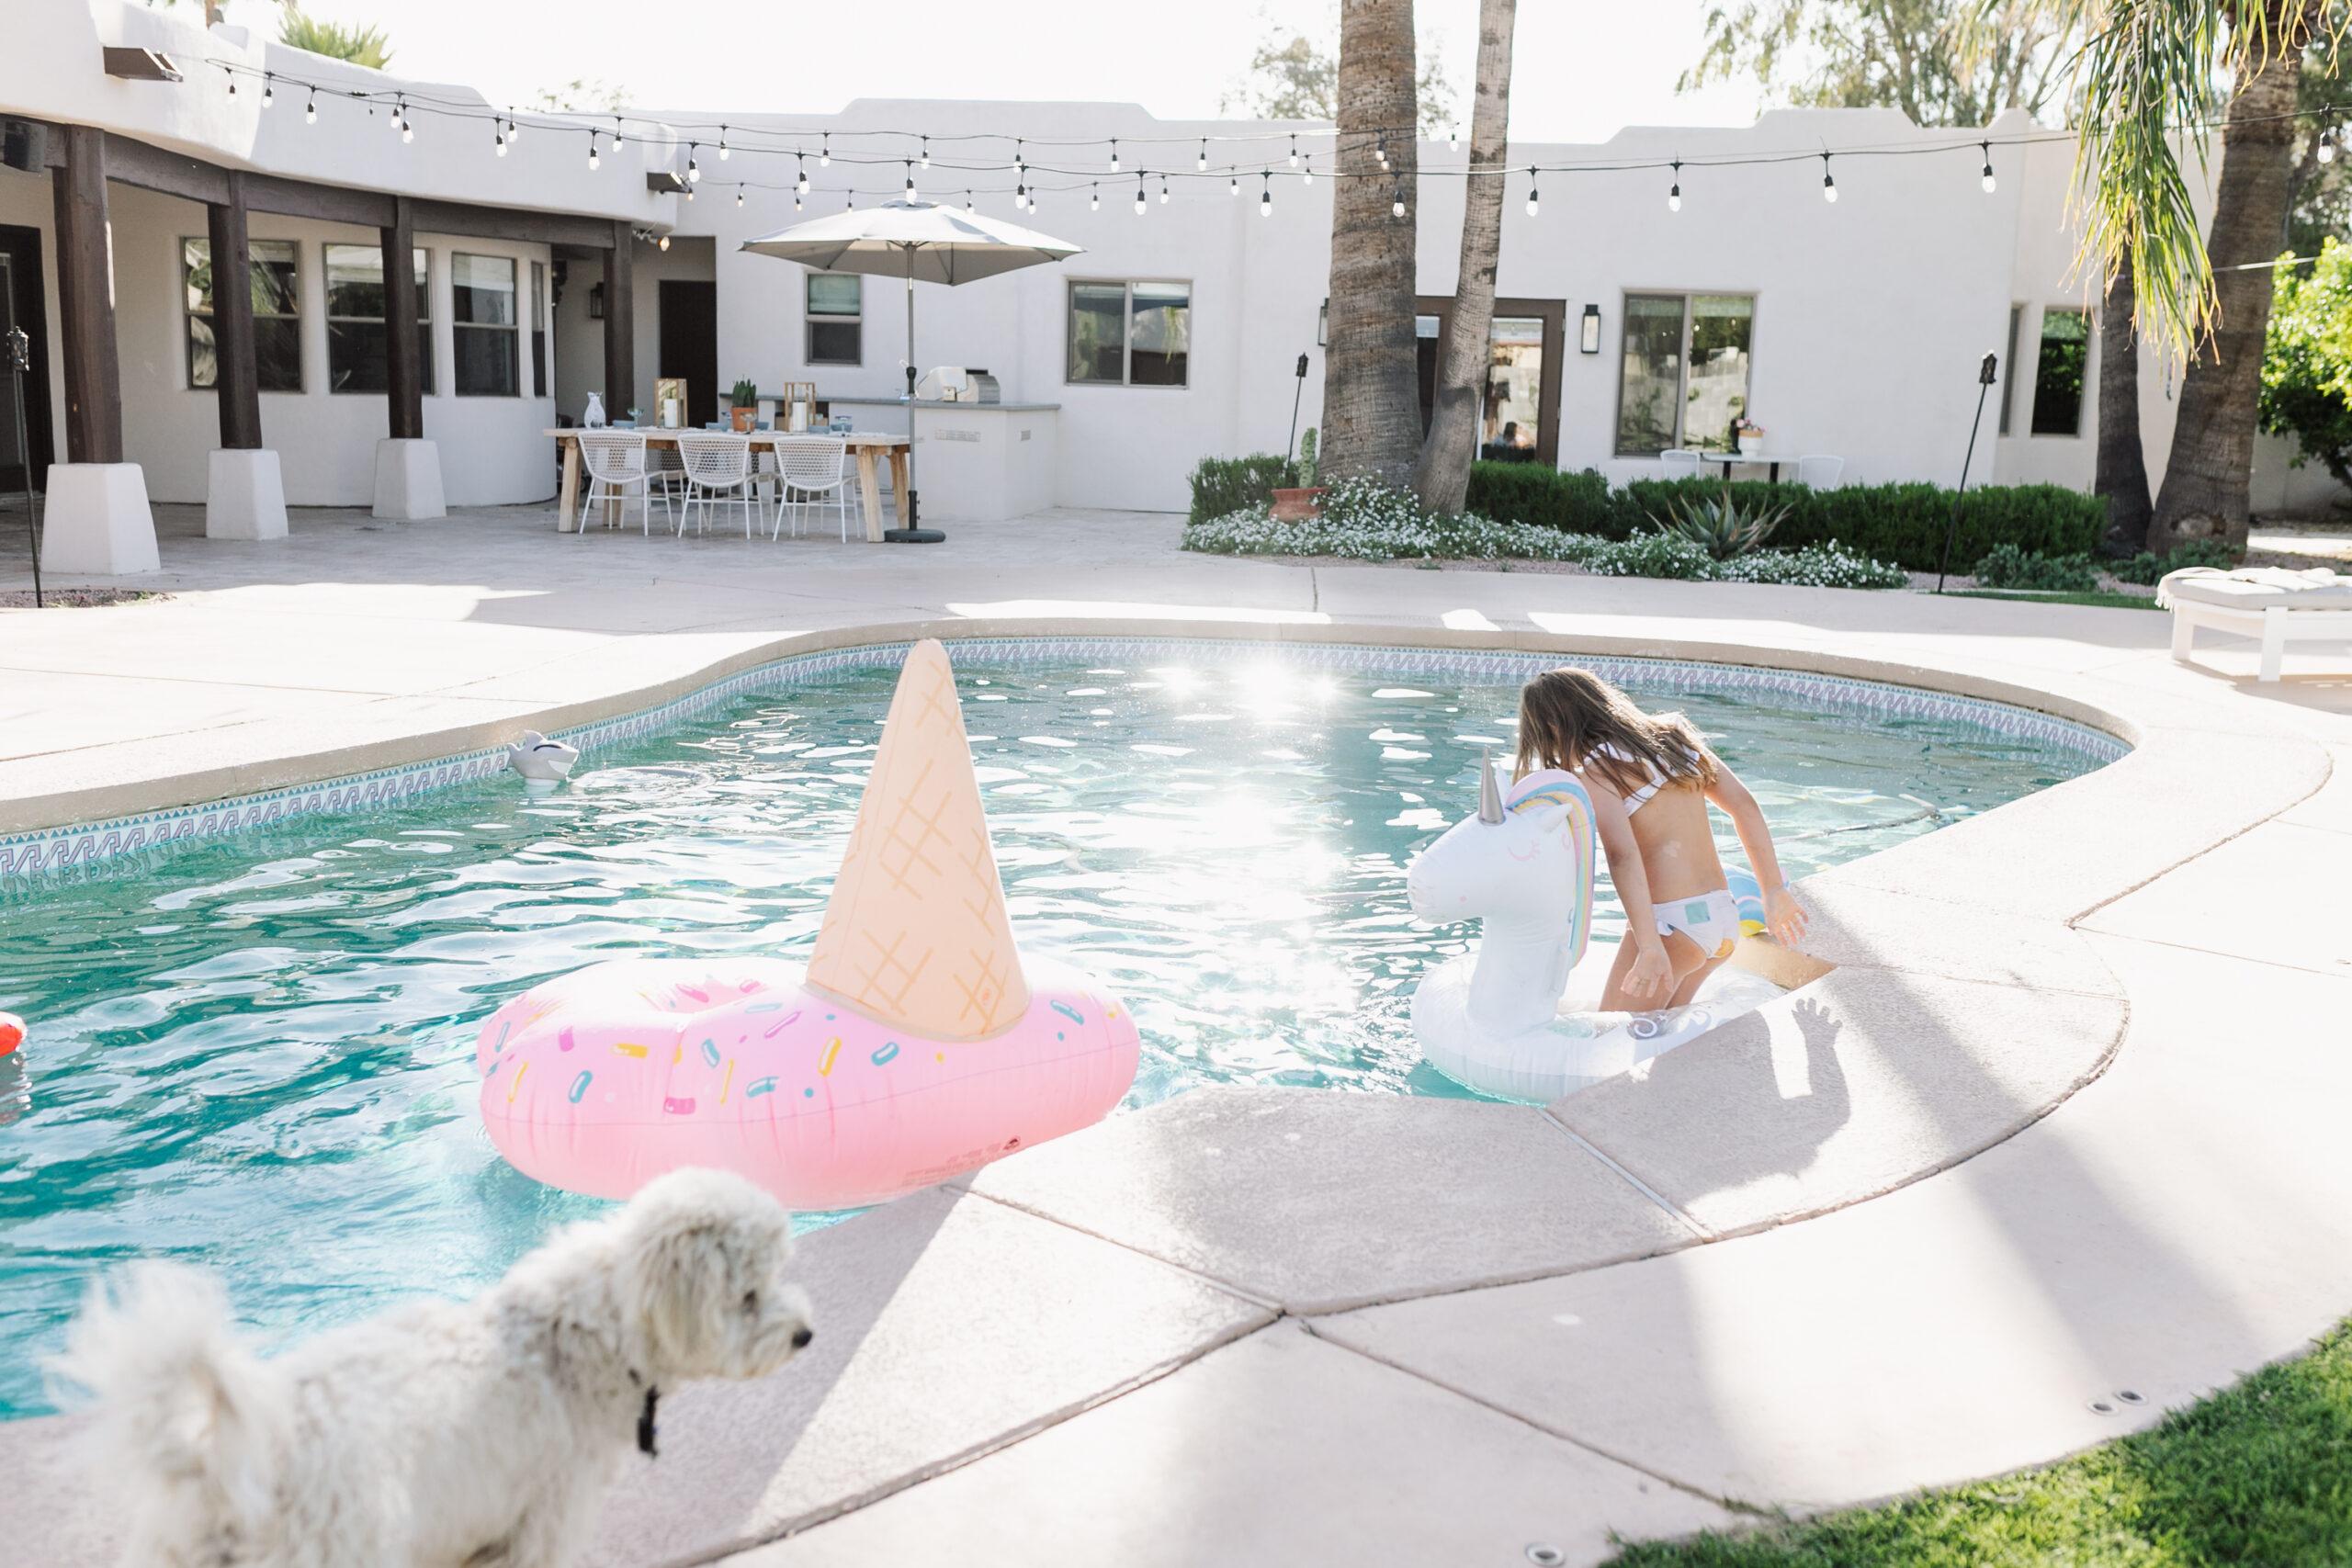 swimming in our backyard #theldlhome #backyardpool #backyardliving